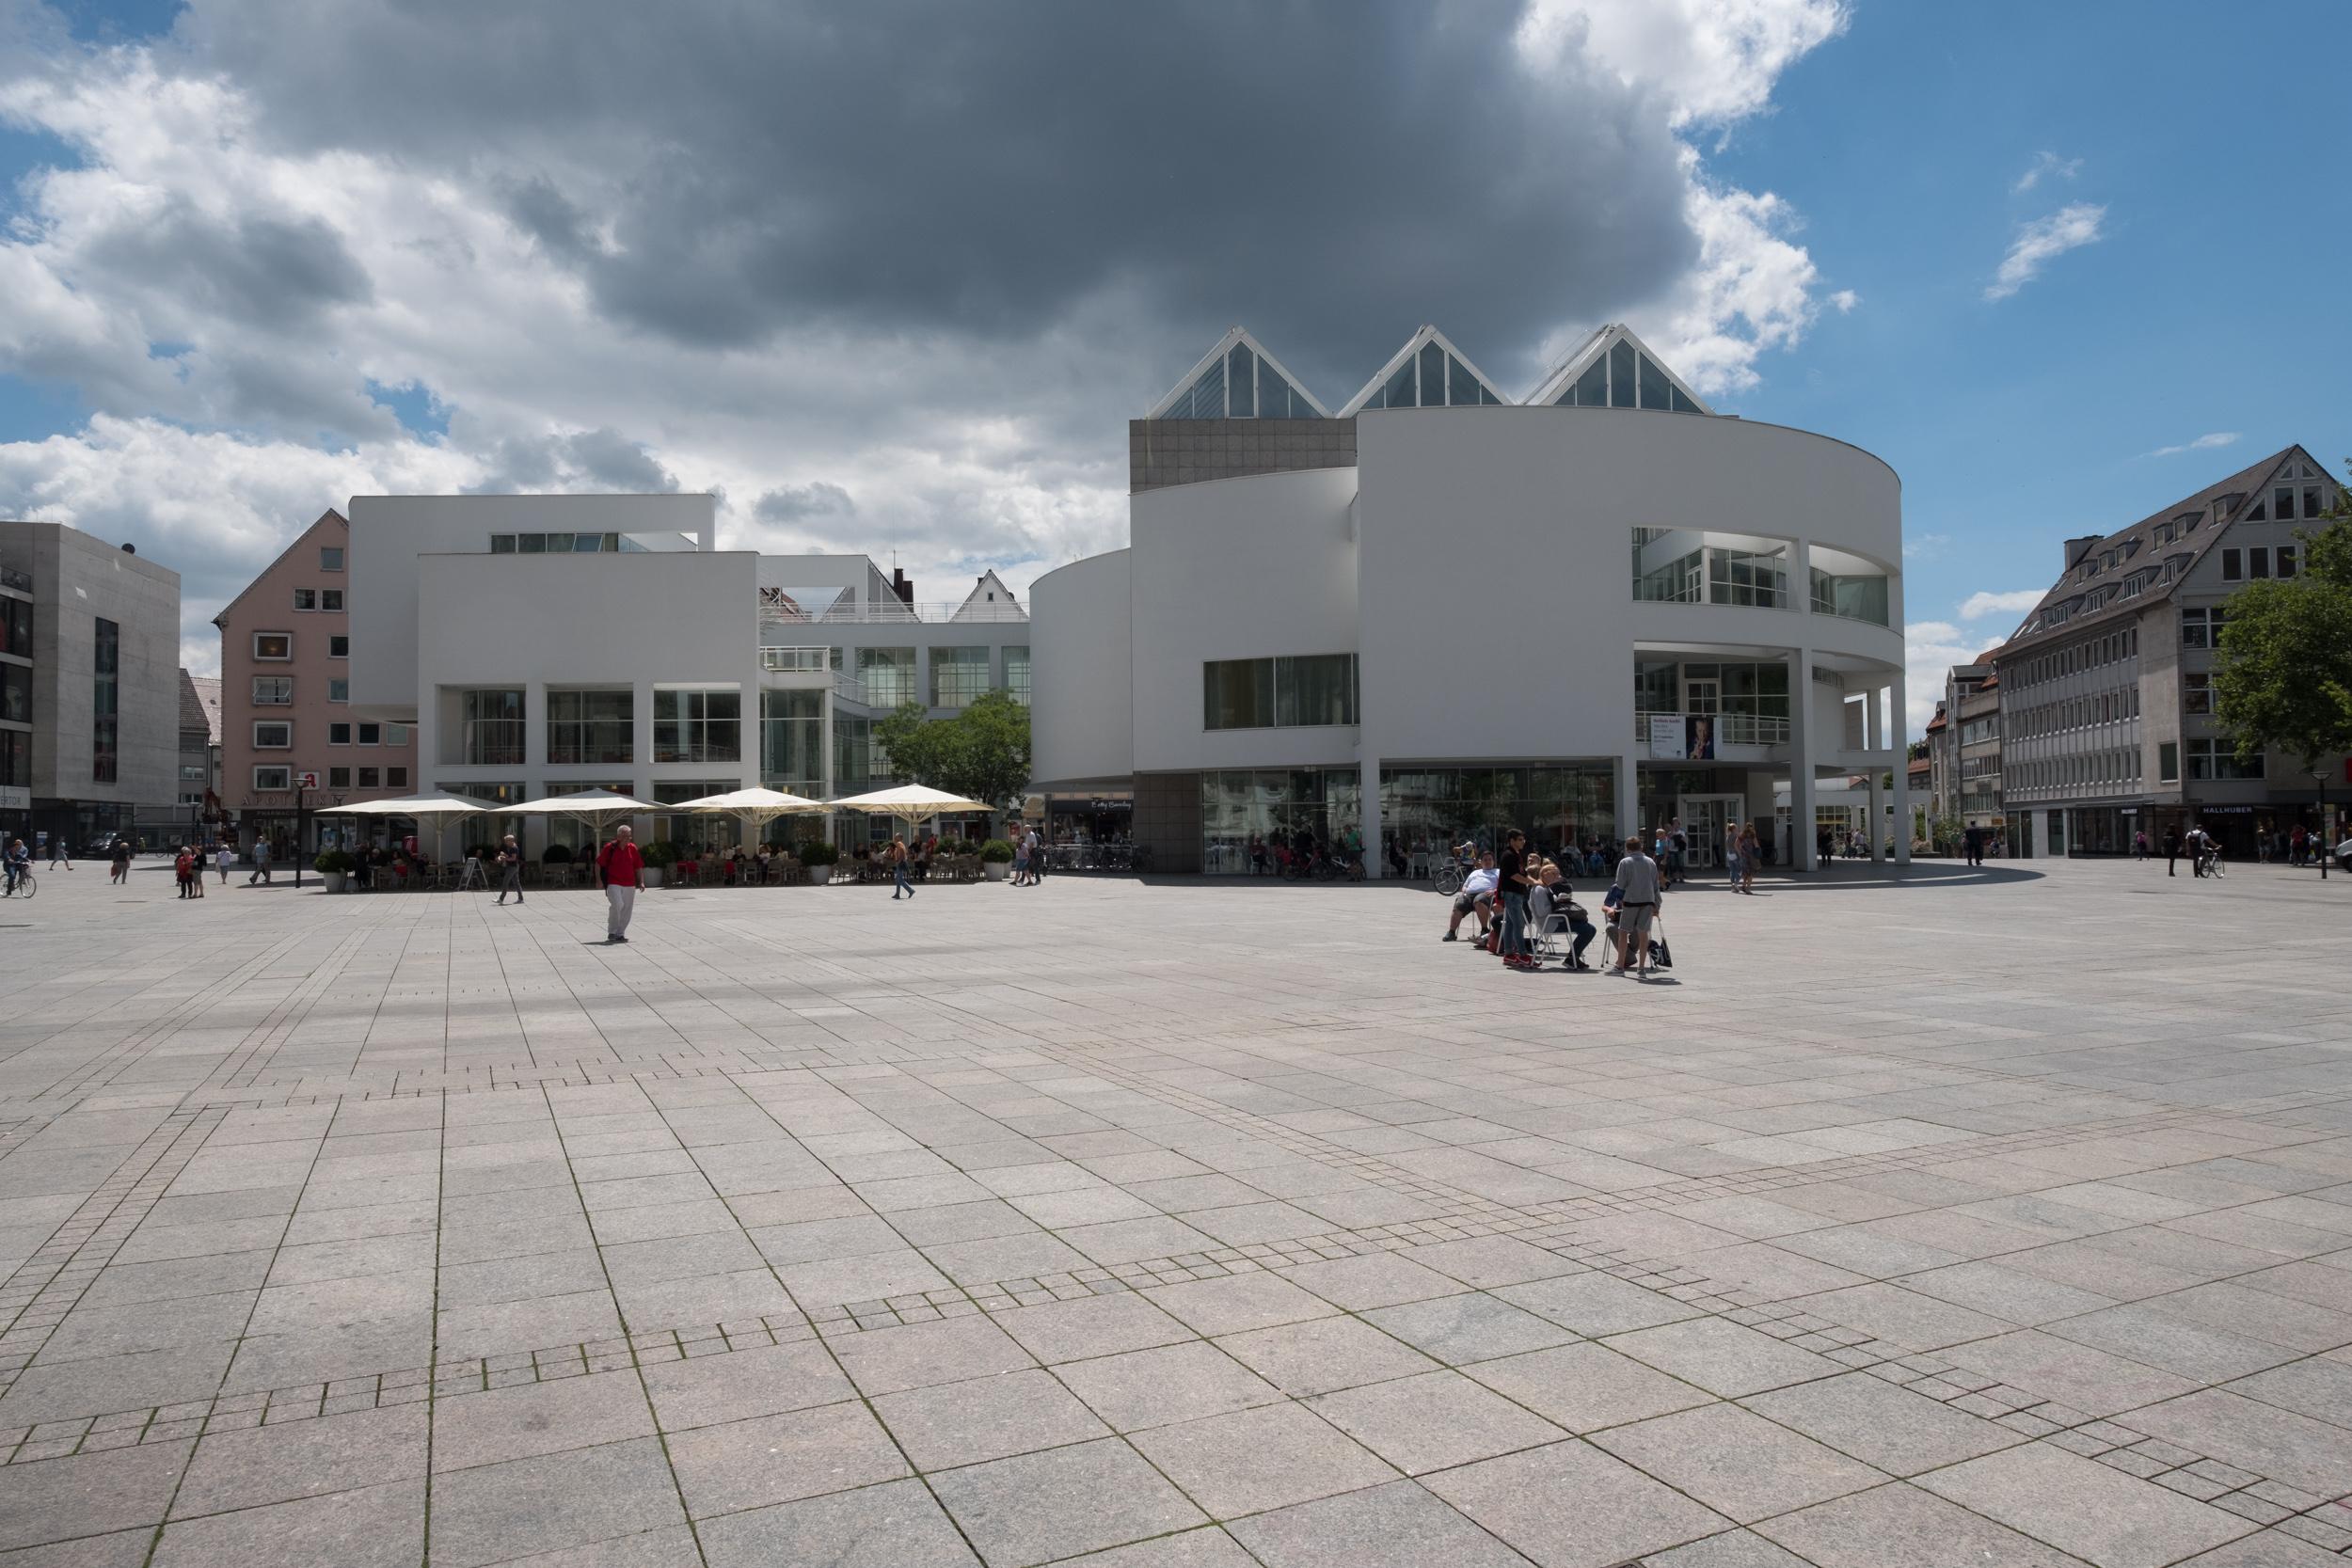 Ulm_2017_7013.jpg